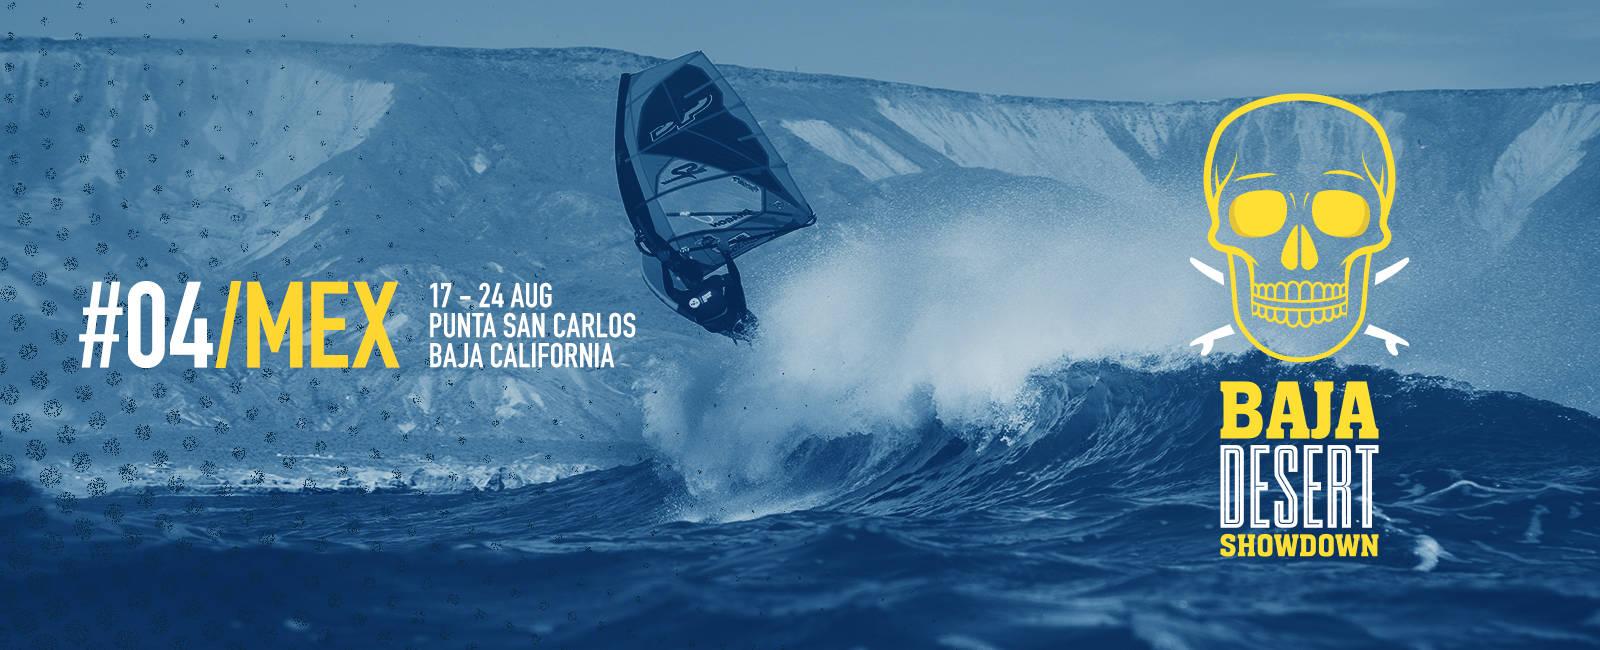 Home - International Windsurfing Tour-Inspiring the Future of Our Sport